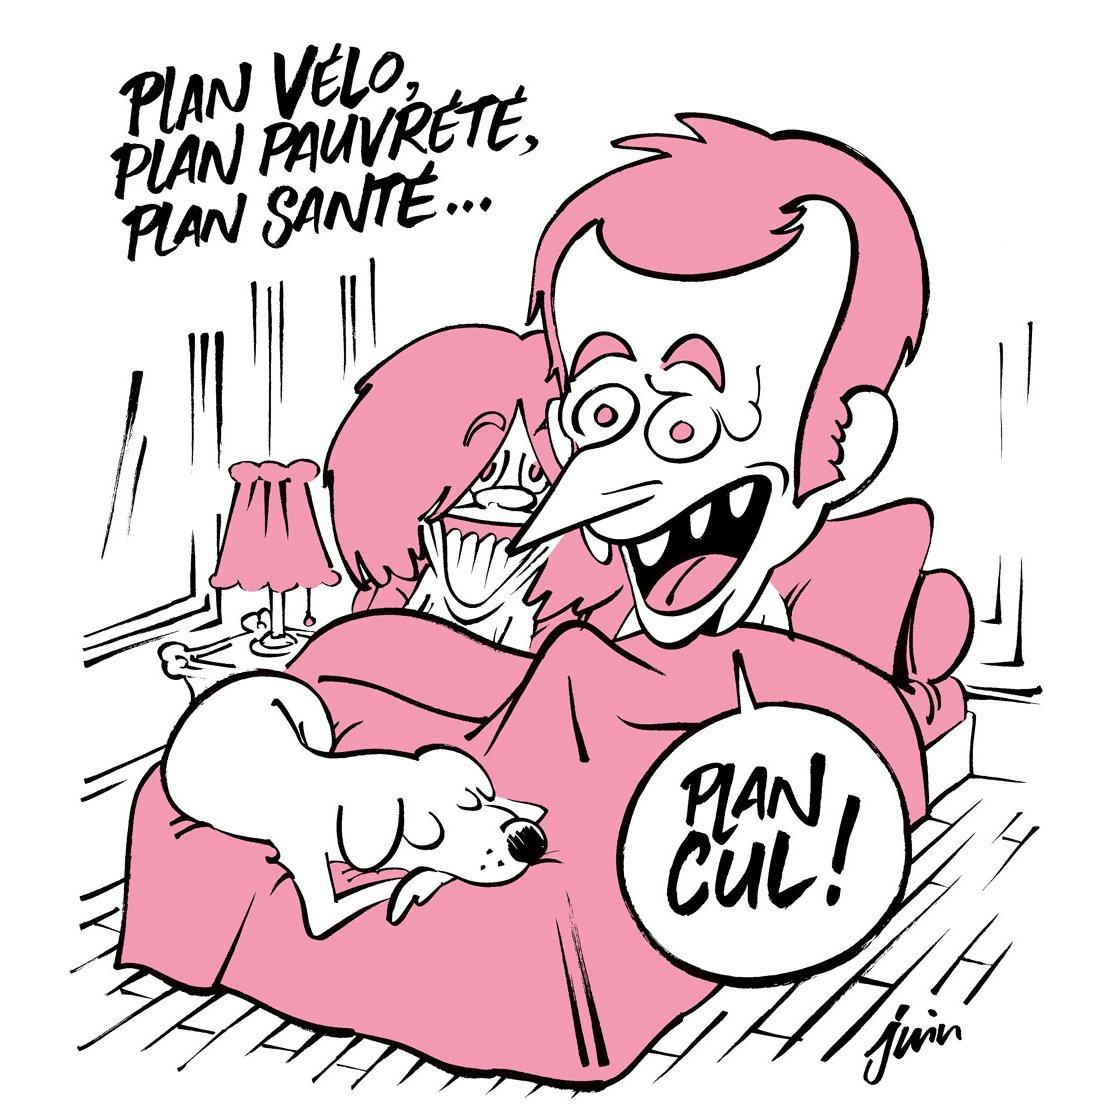 #PlanVelo Latest News Trends Updates Images - Charlie_Hebdo_